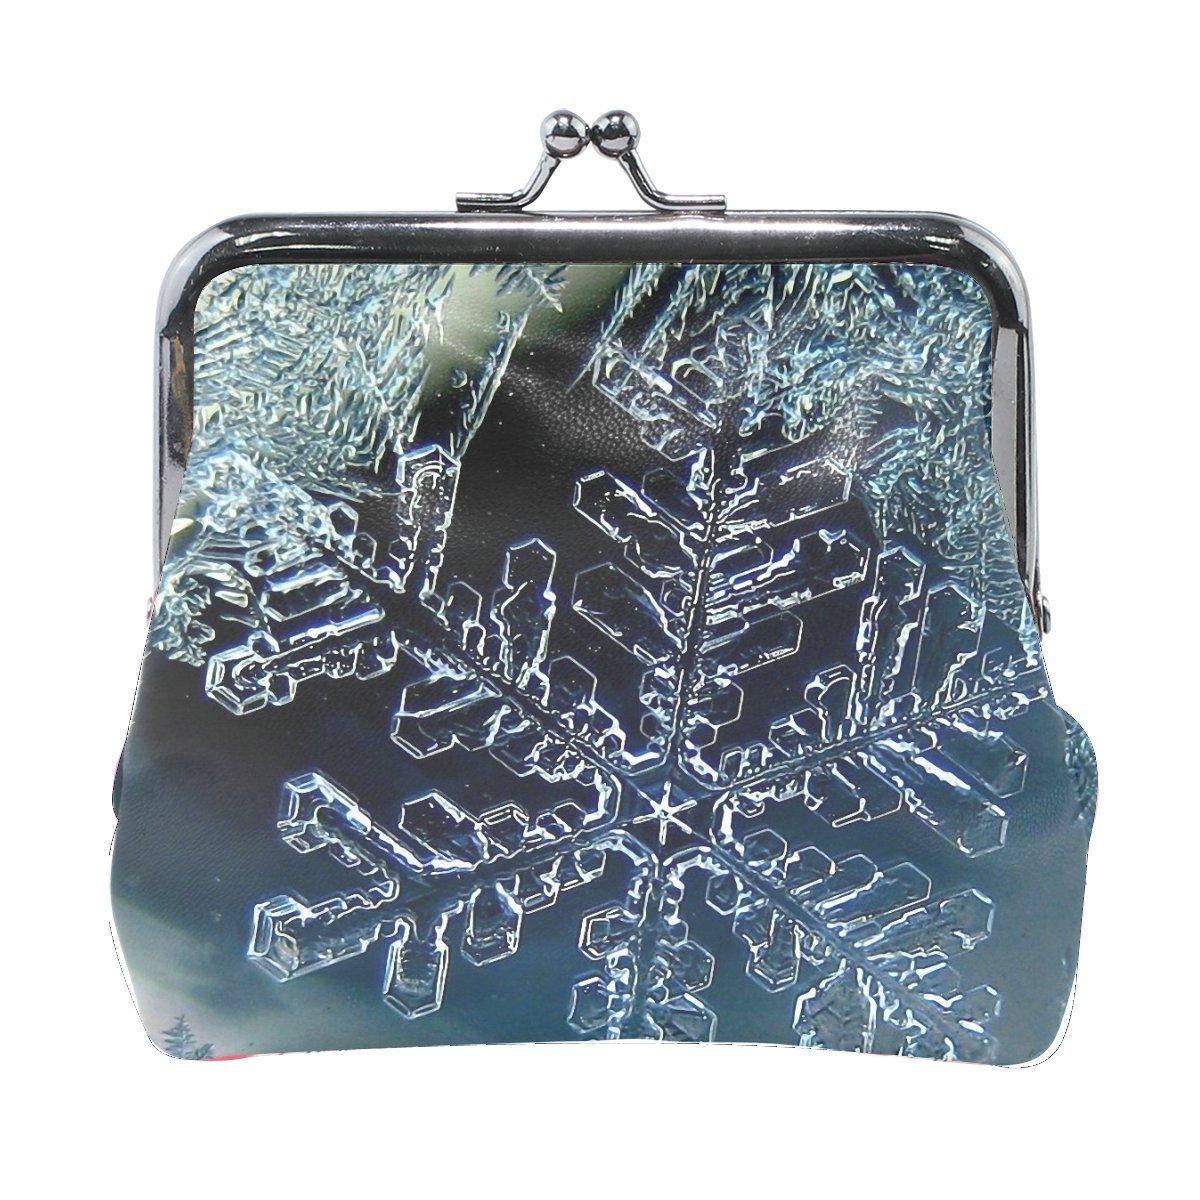 Women Snowflake Winter Macro Ice Print Wallet Exquisite Clasp Coin Purse Girls Clutch Handbag